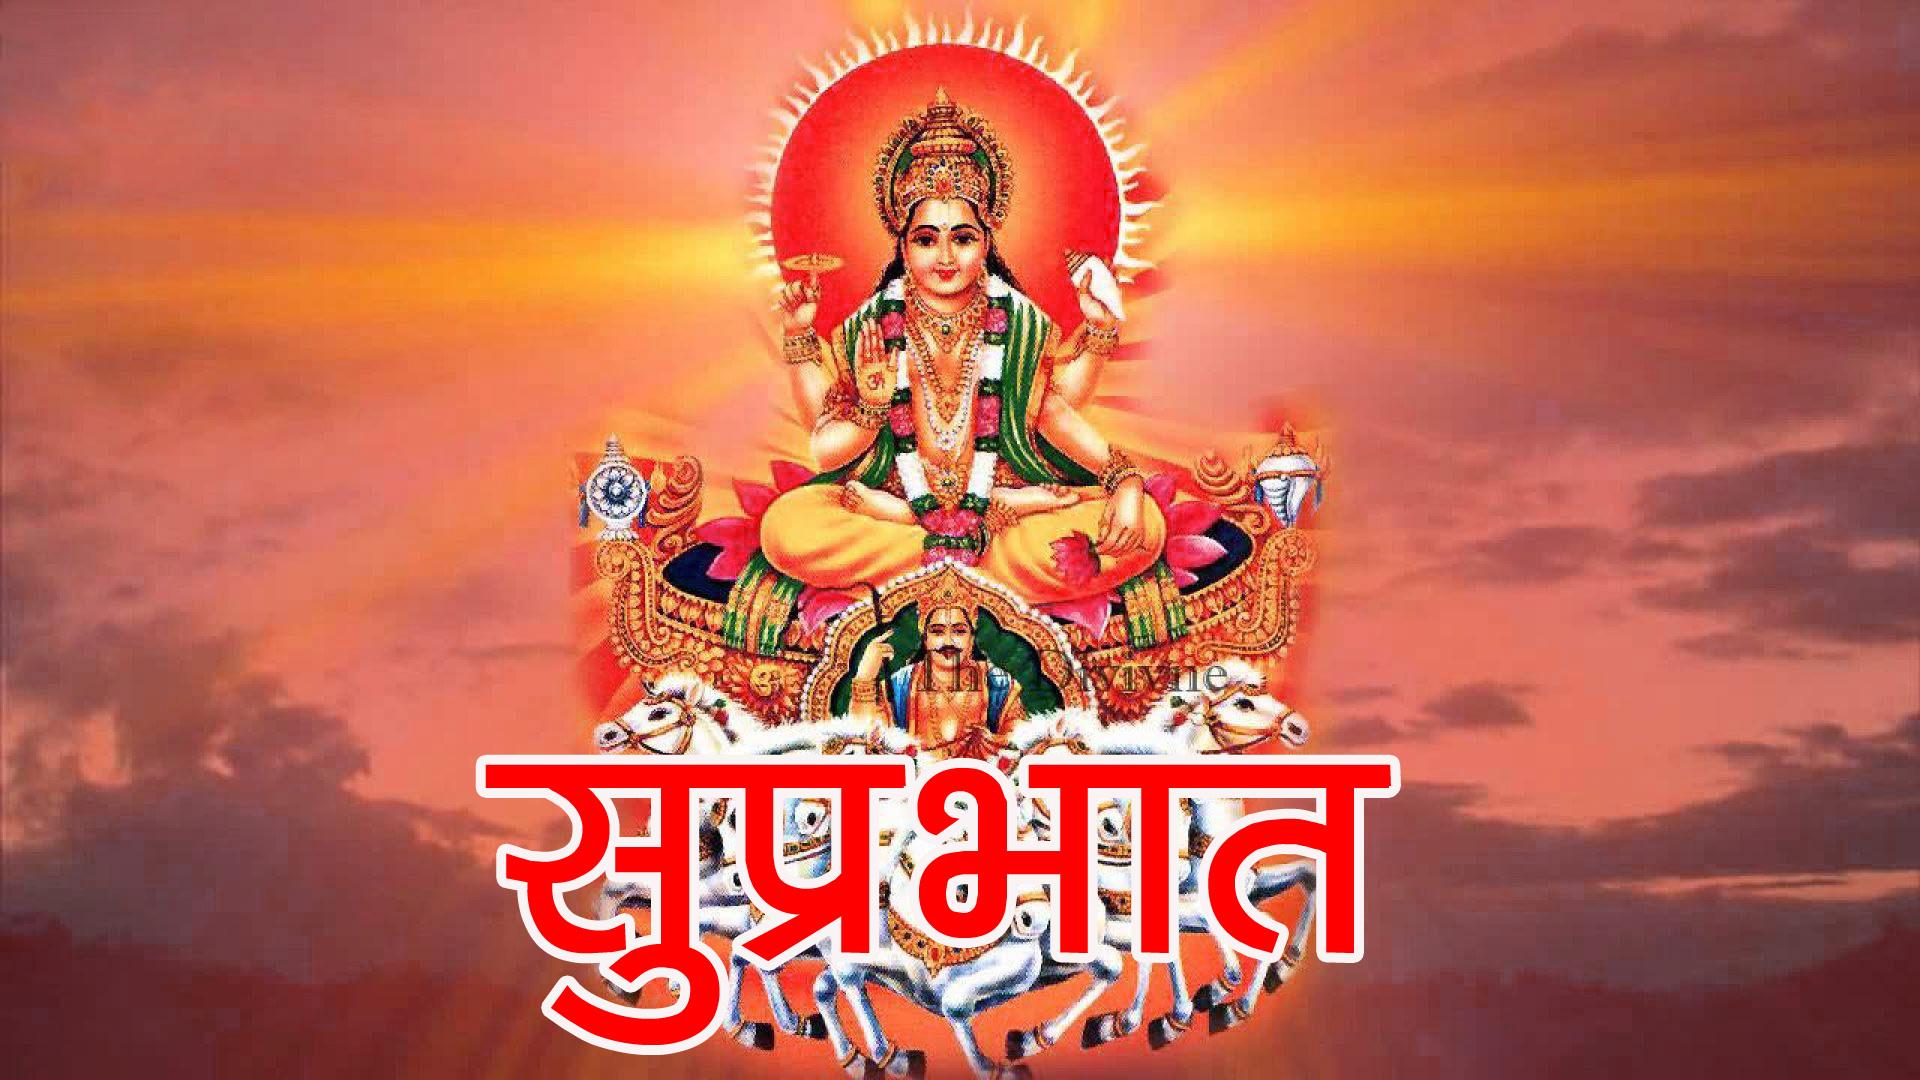 Suprabhat God Images Pics Free Latest